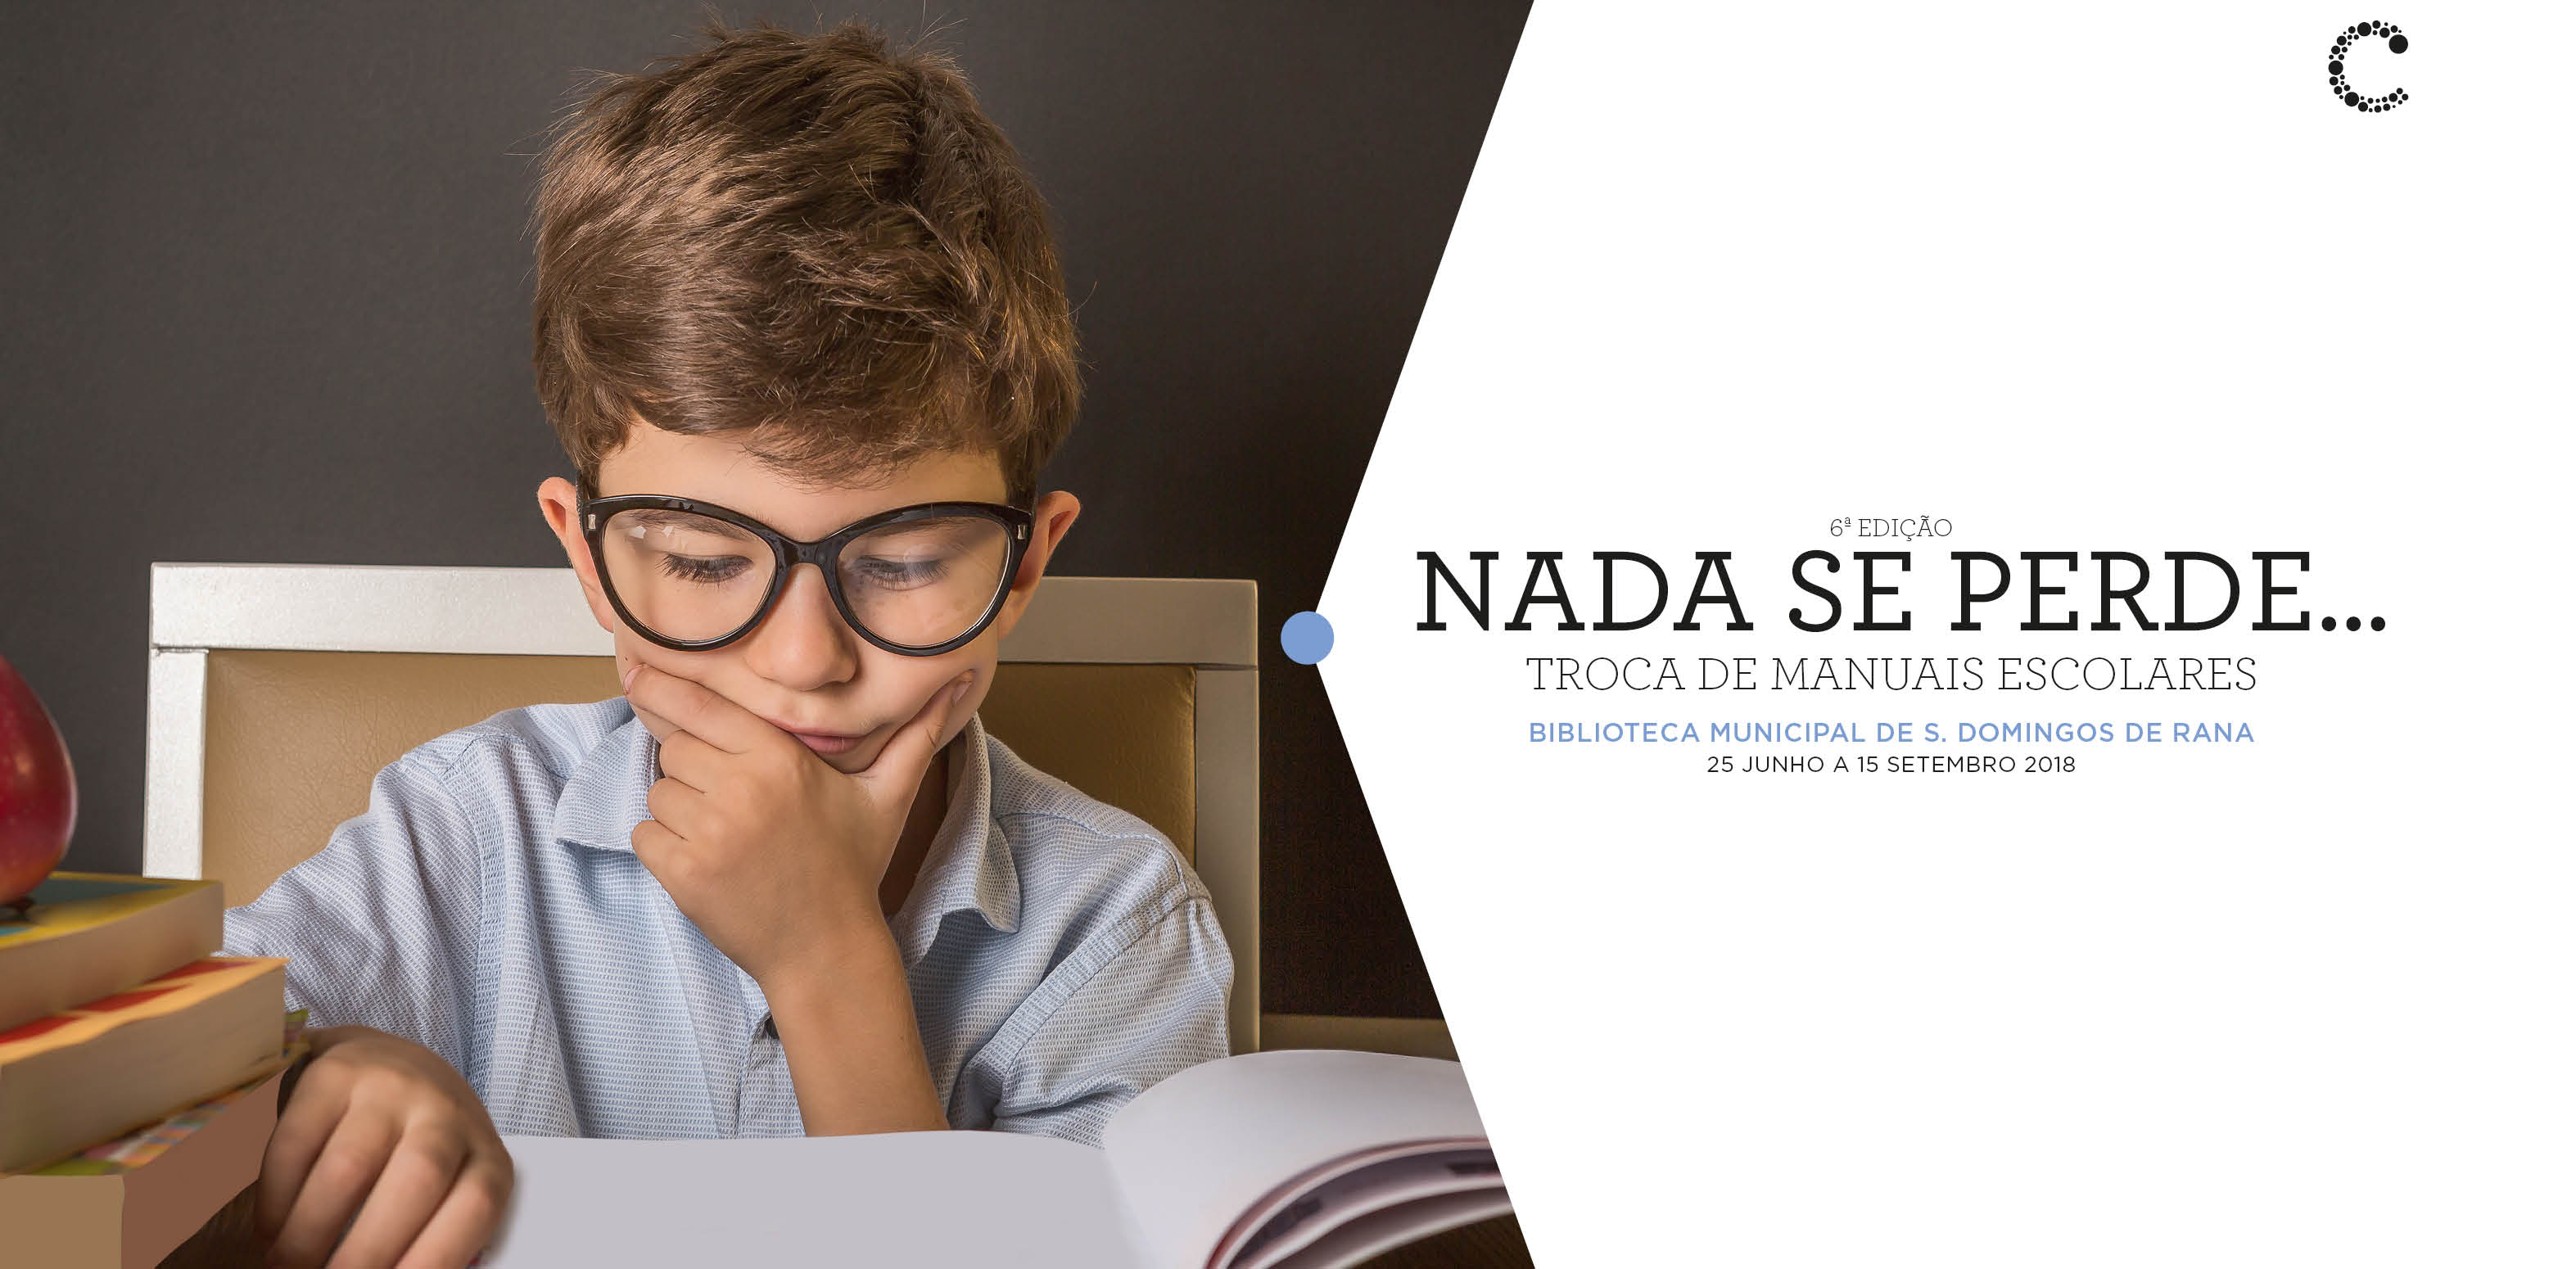 NADA SE PERDE… TROCA DE MANUAIS ESCOLARES